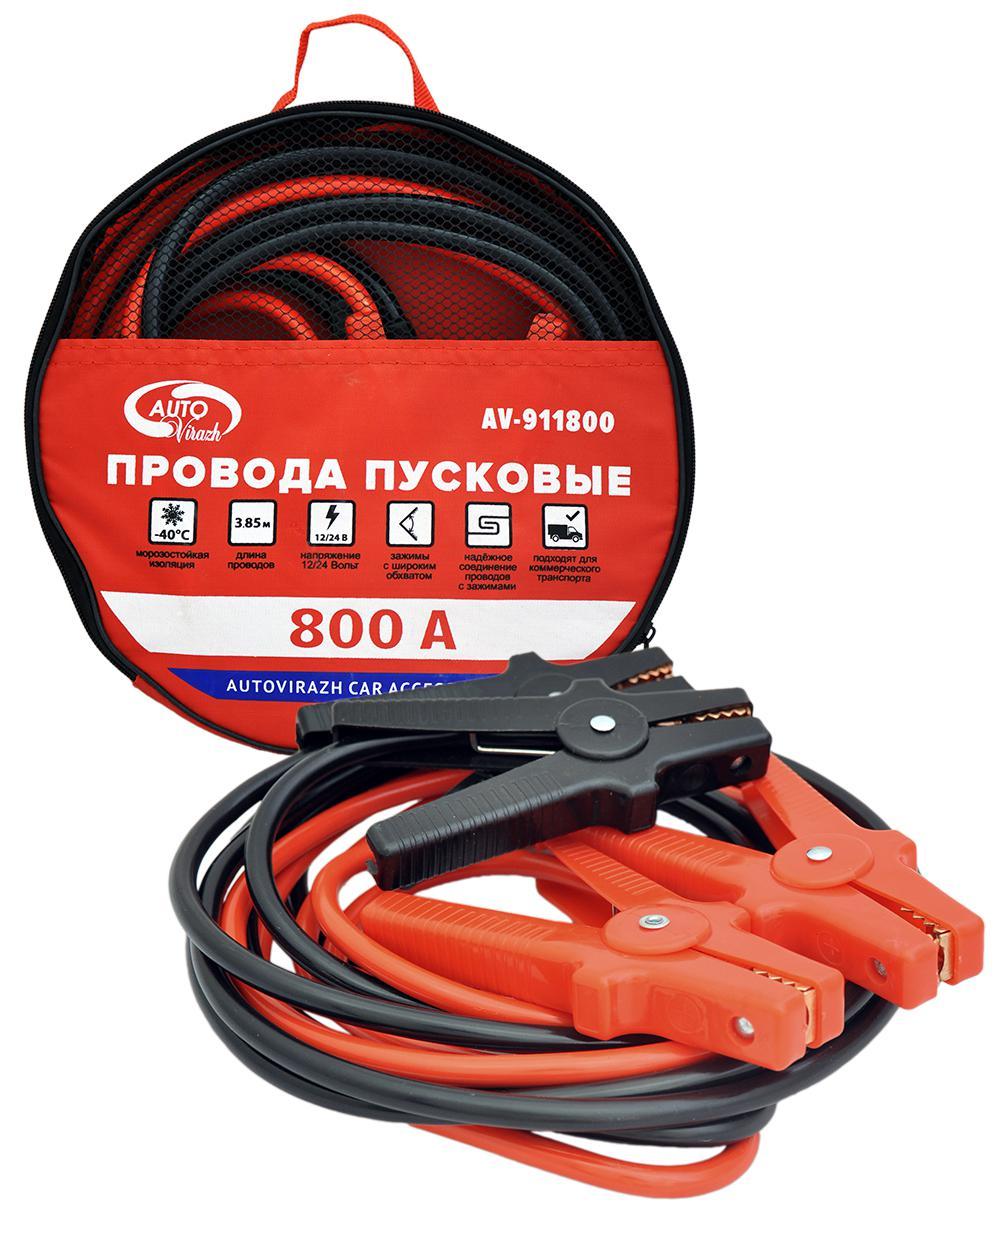 Провода стартовые Autovirazh Av-911800 цена